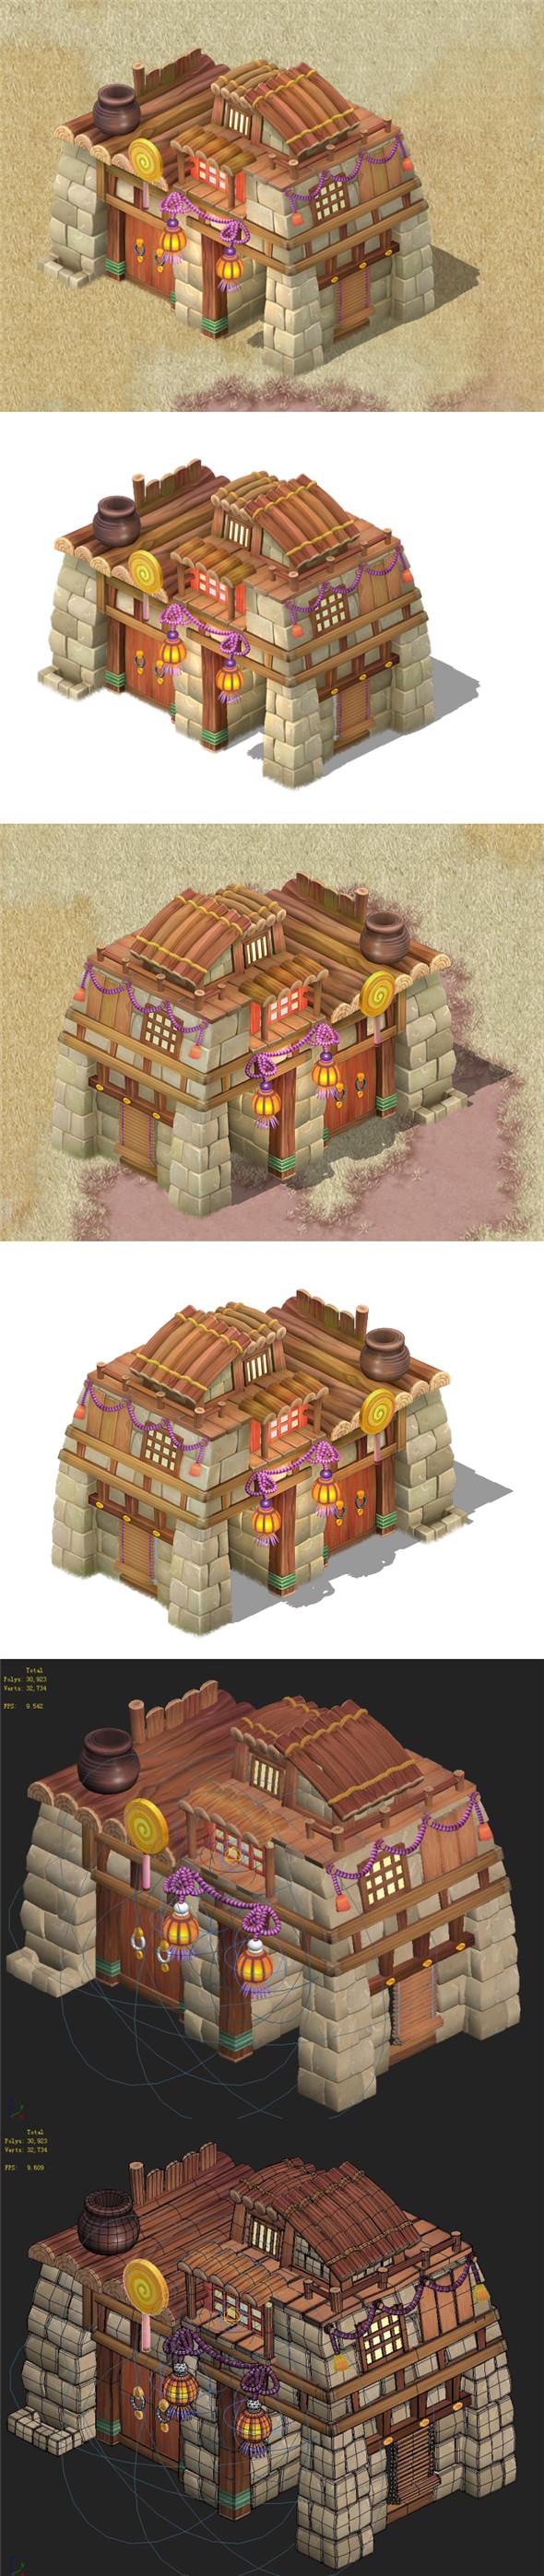 Cartoon version - House 0303 - 3DOcean Item for Sale